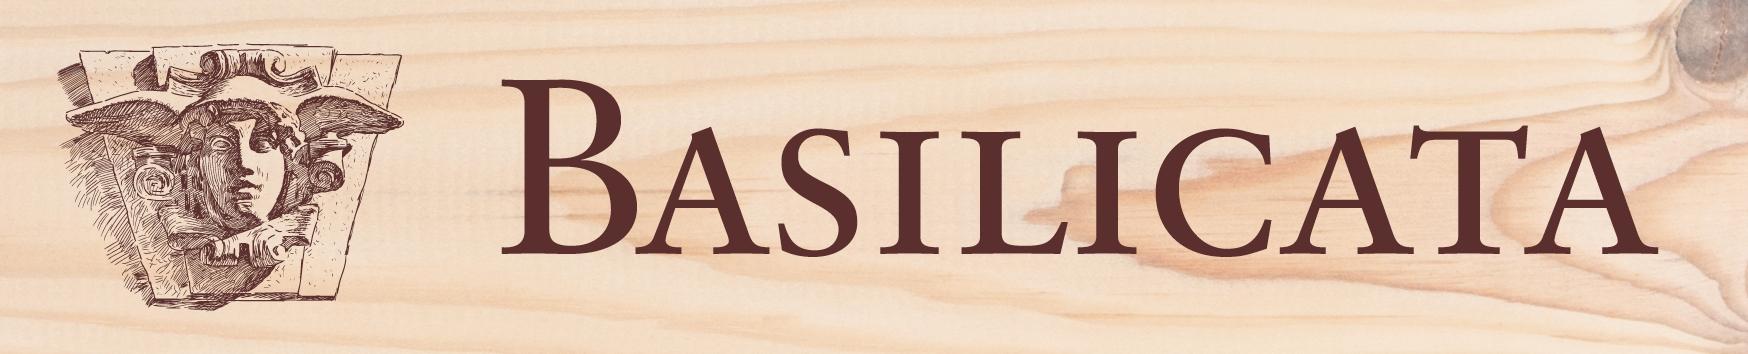 Basilikata